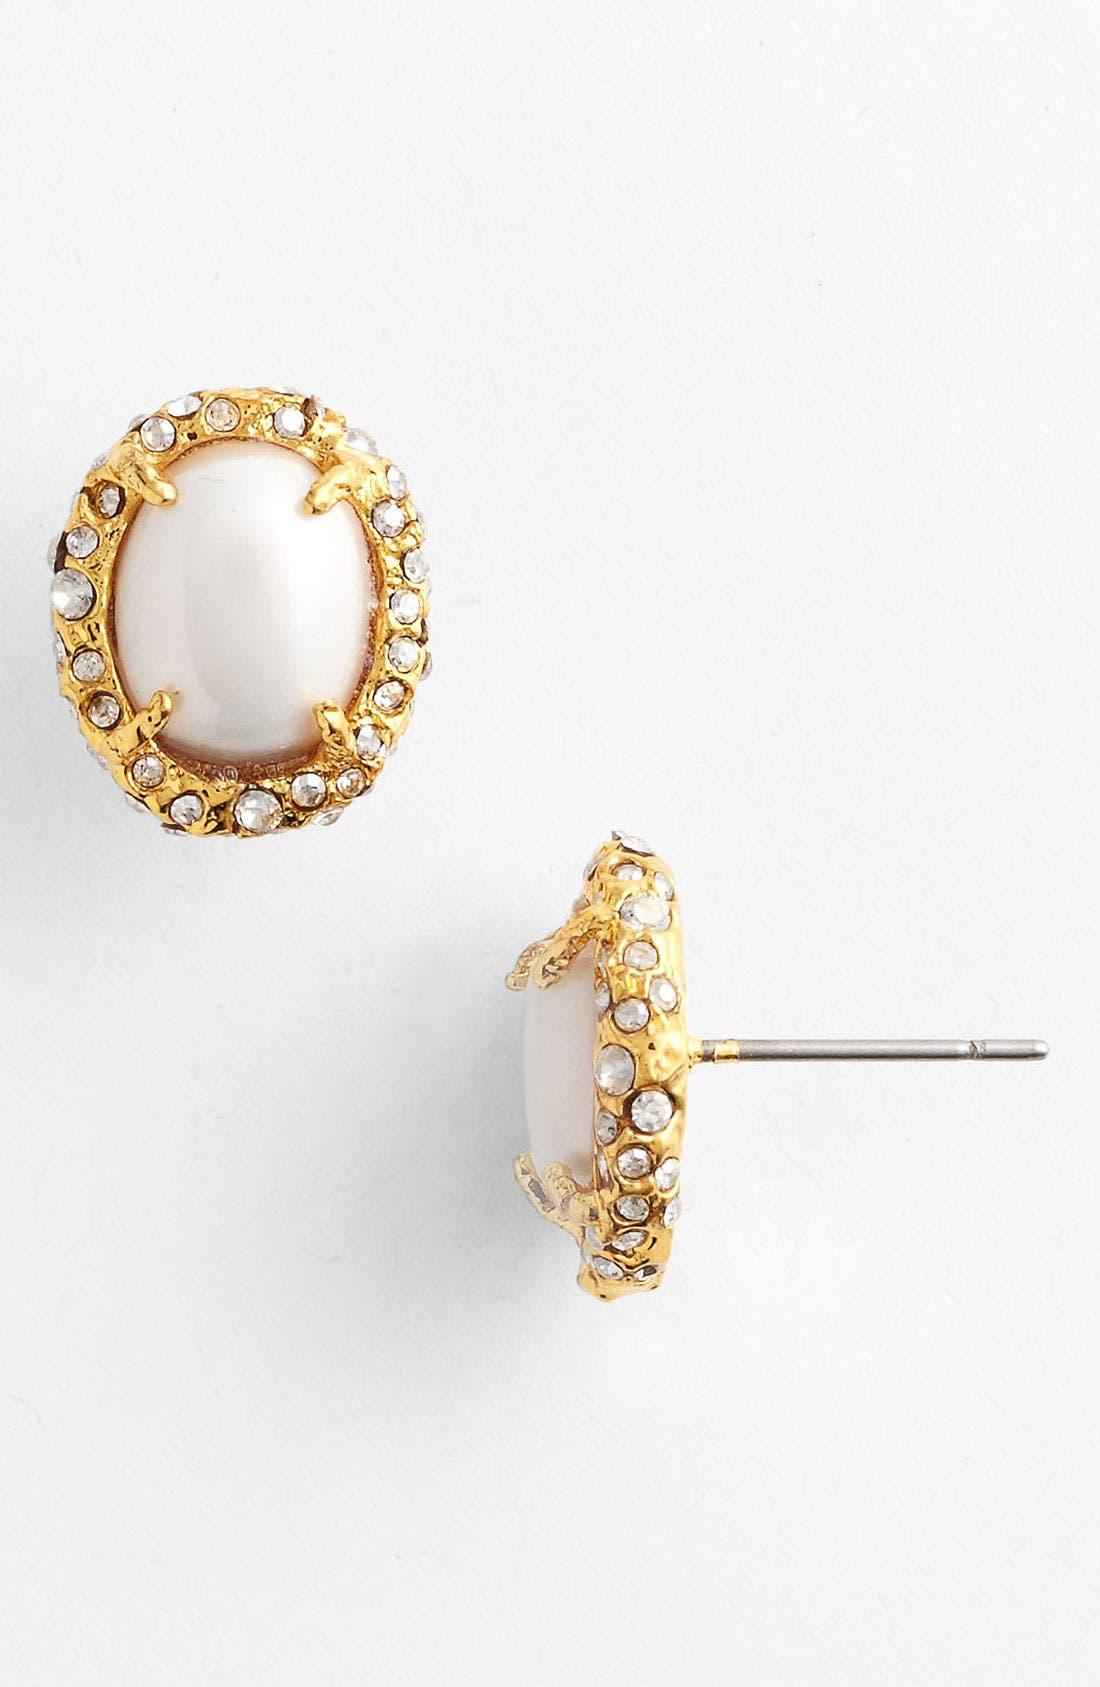 Main Image - Alexis Bittar 'Elements - Siyabona' Stone Stud Earrings